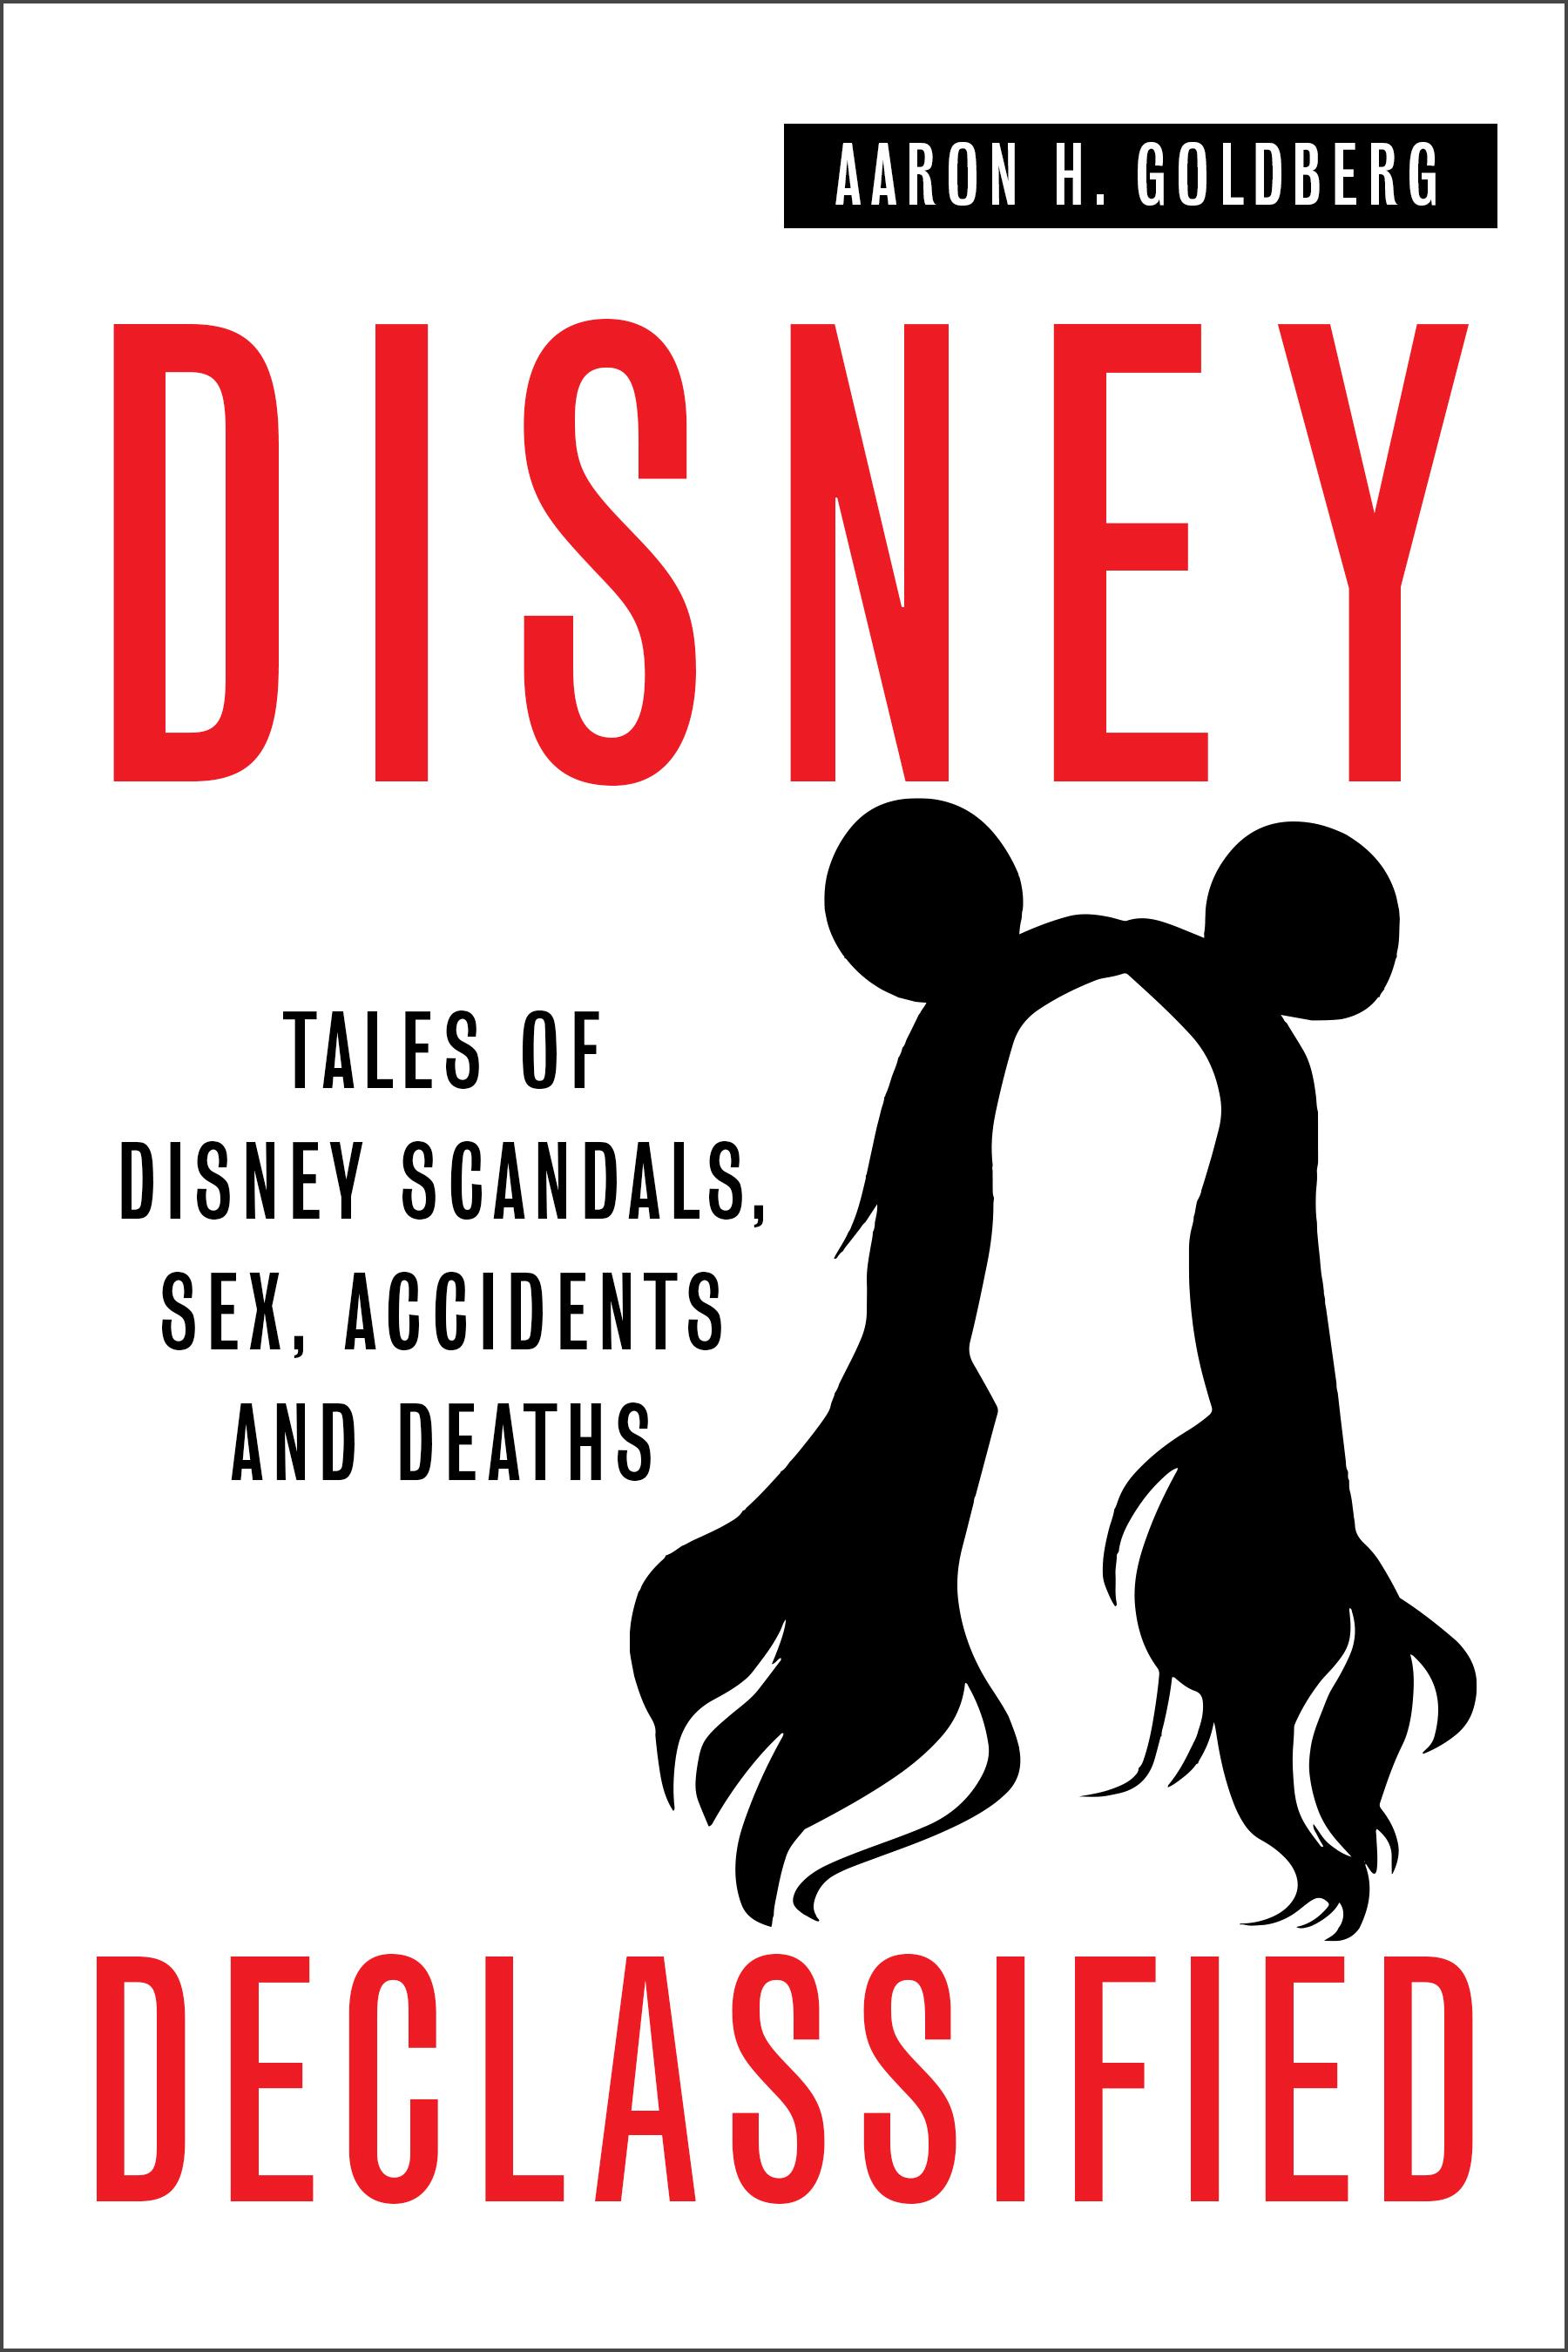 Disney_Declassified_2016_ebook_cover.jpg